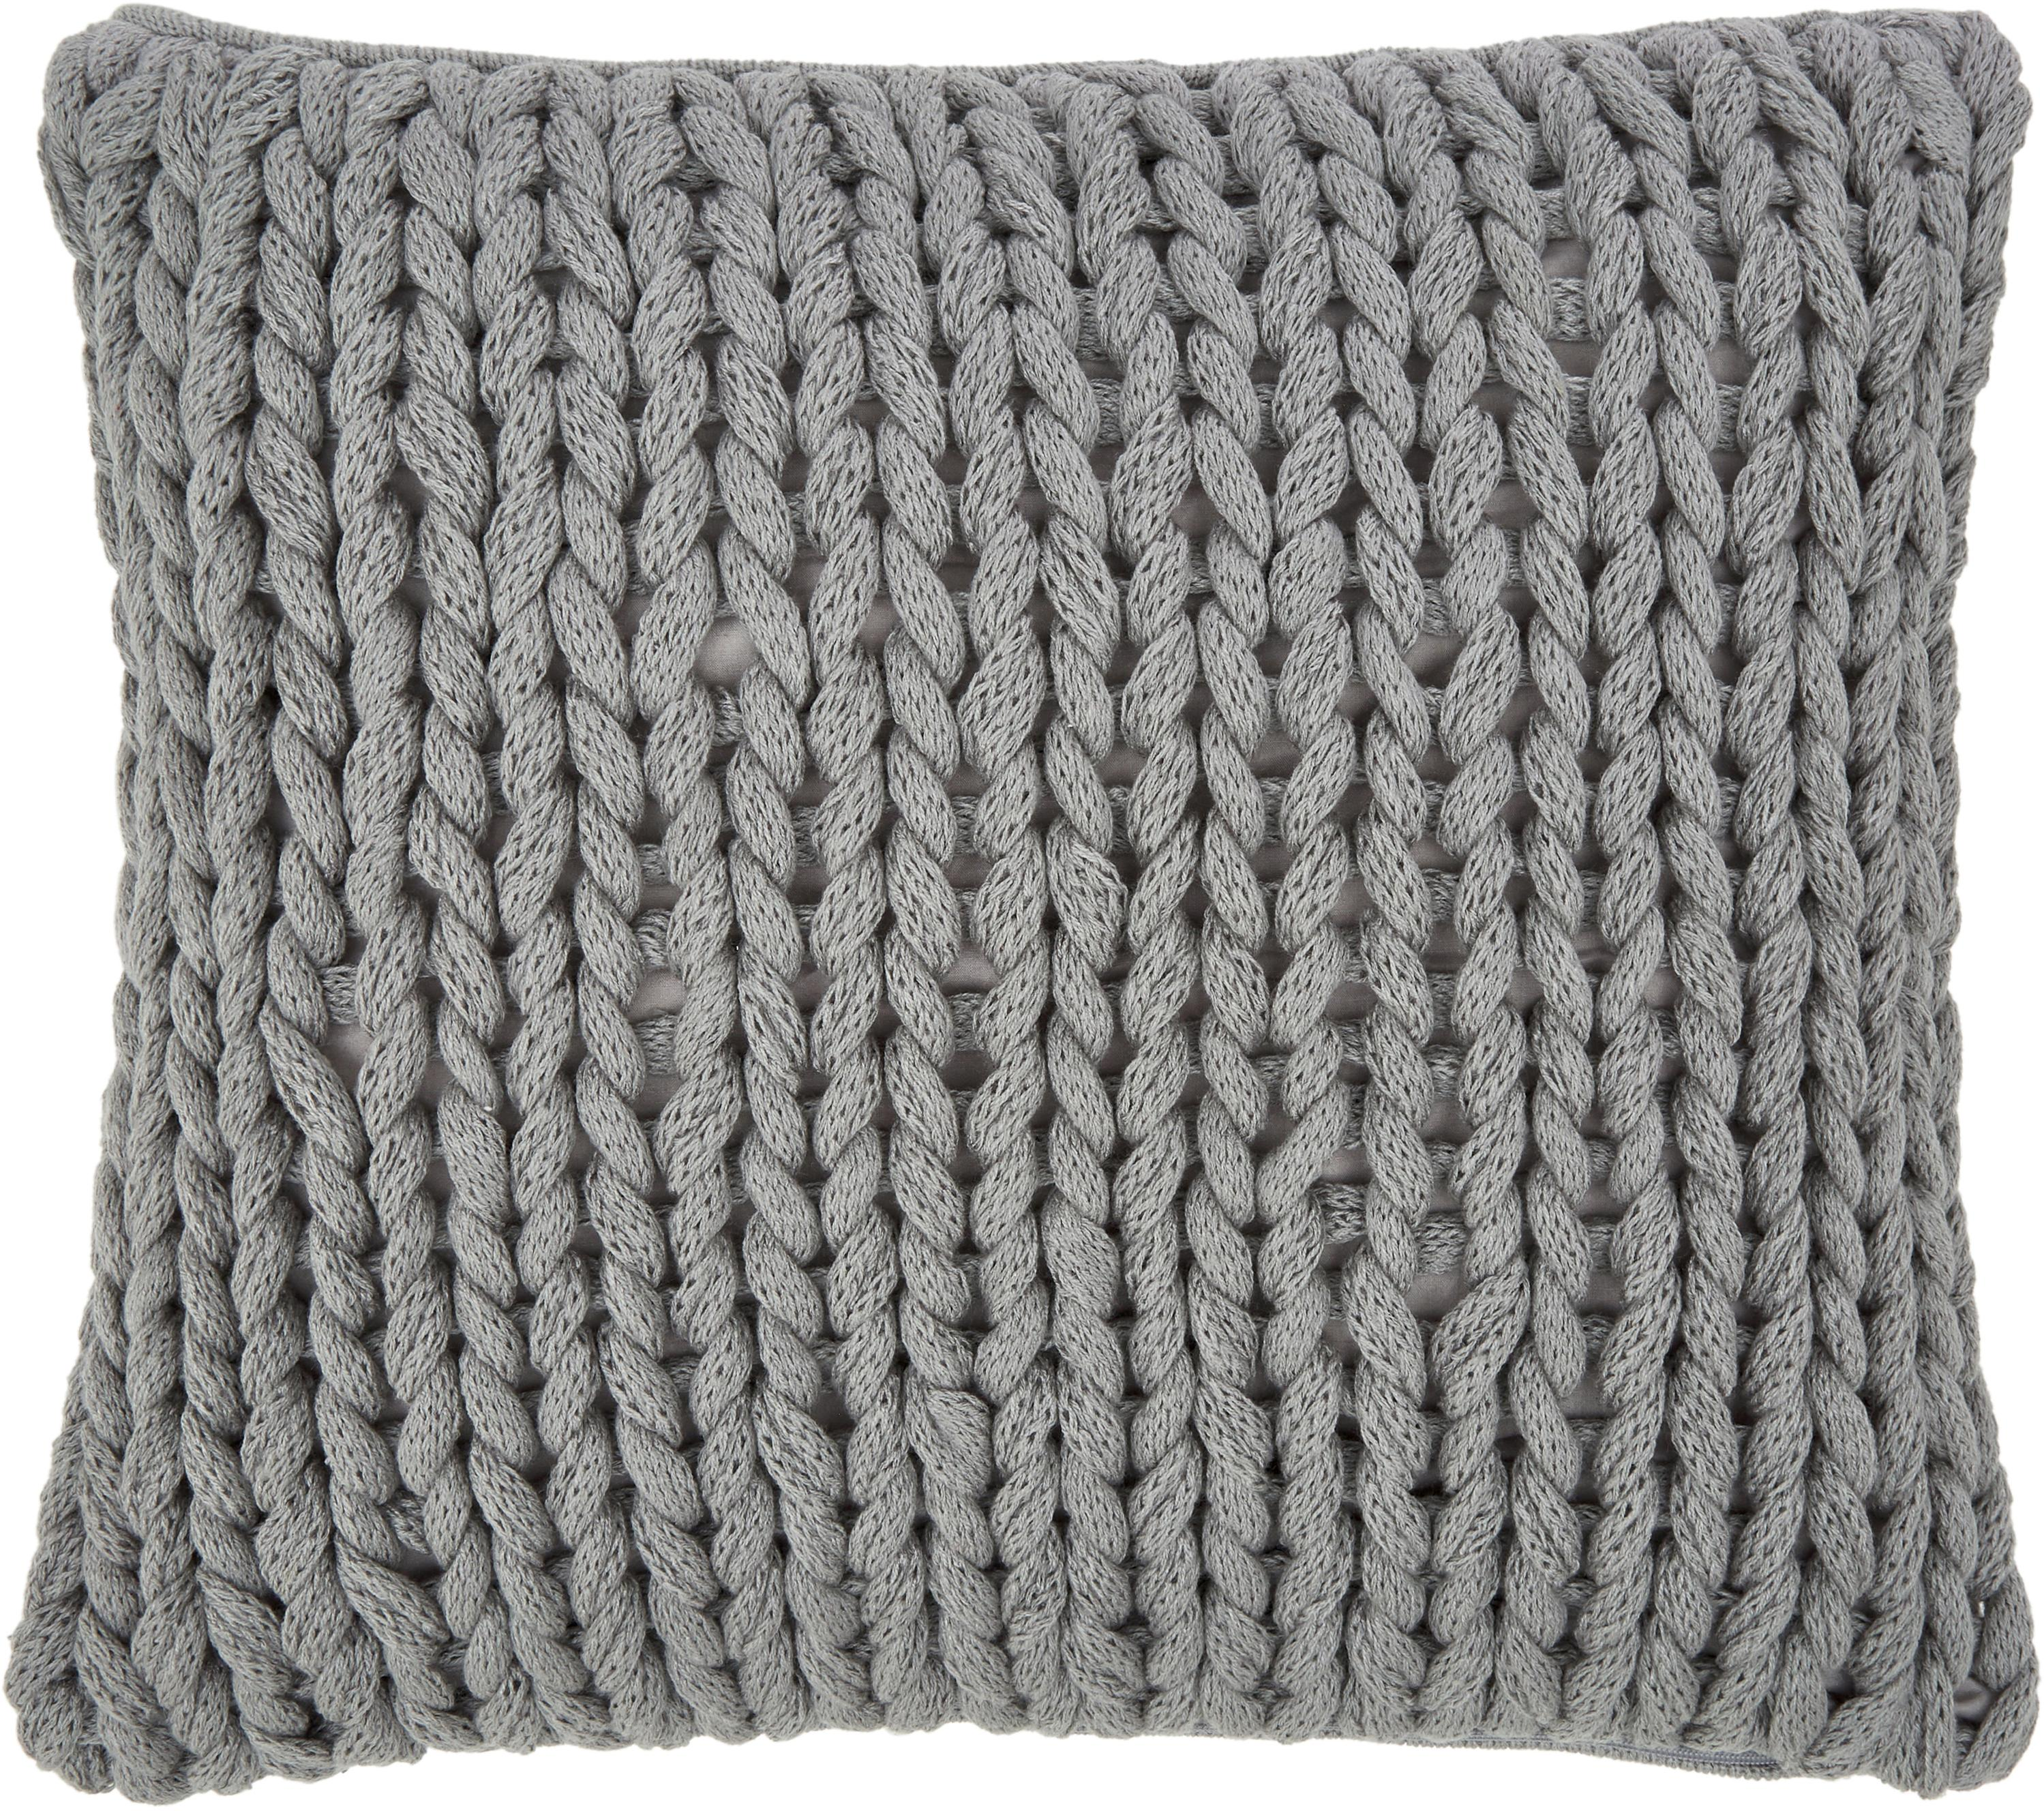 Federa arredo a maglia grossa Adyna, 100% poliacrilico, Grigio chiaro, Larg. 45 x Lung. 45 cm